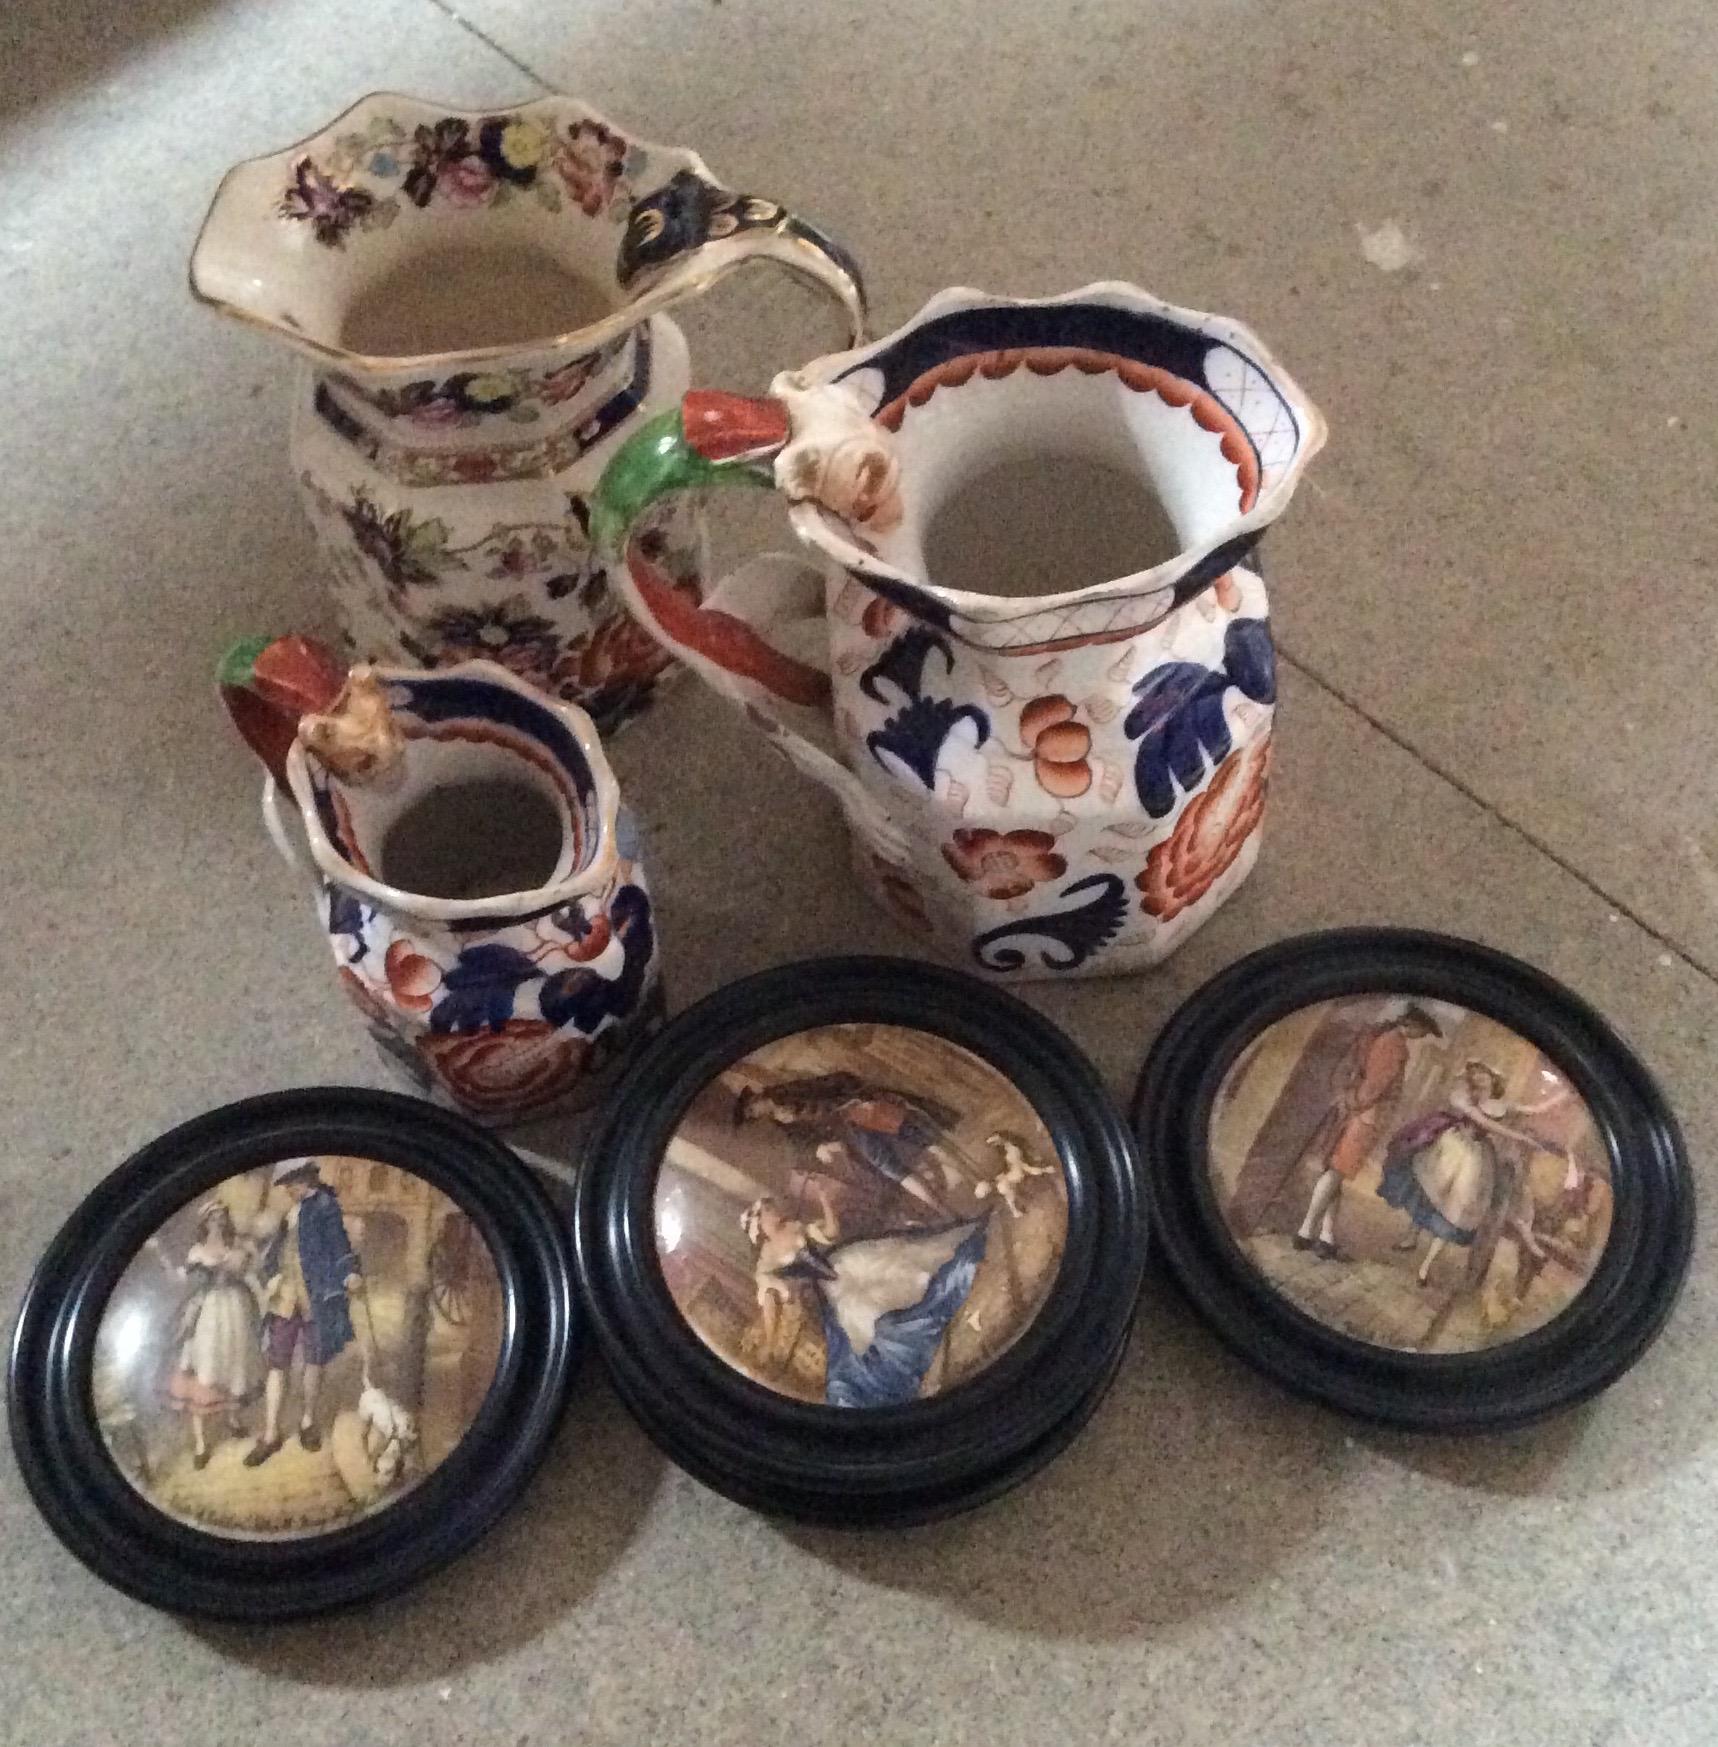 Lot 55 - Three Masons jugs and four Cries of London pot lids